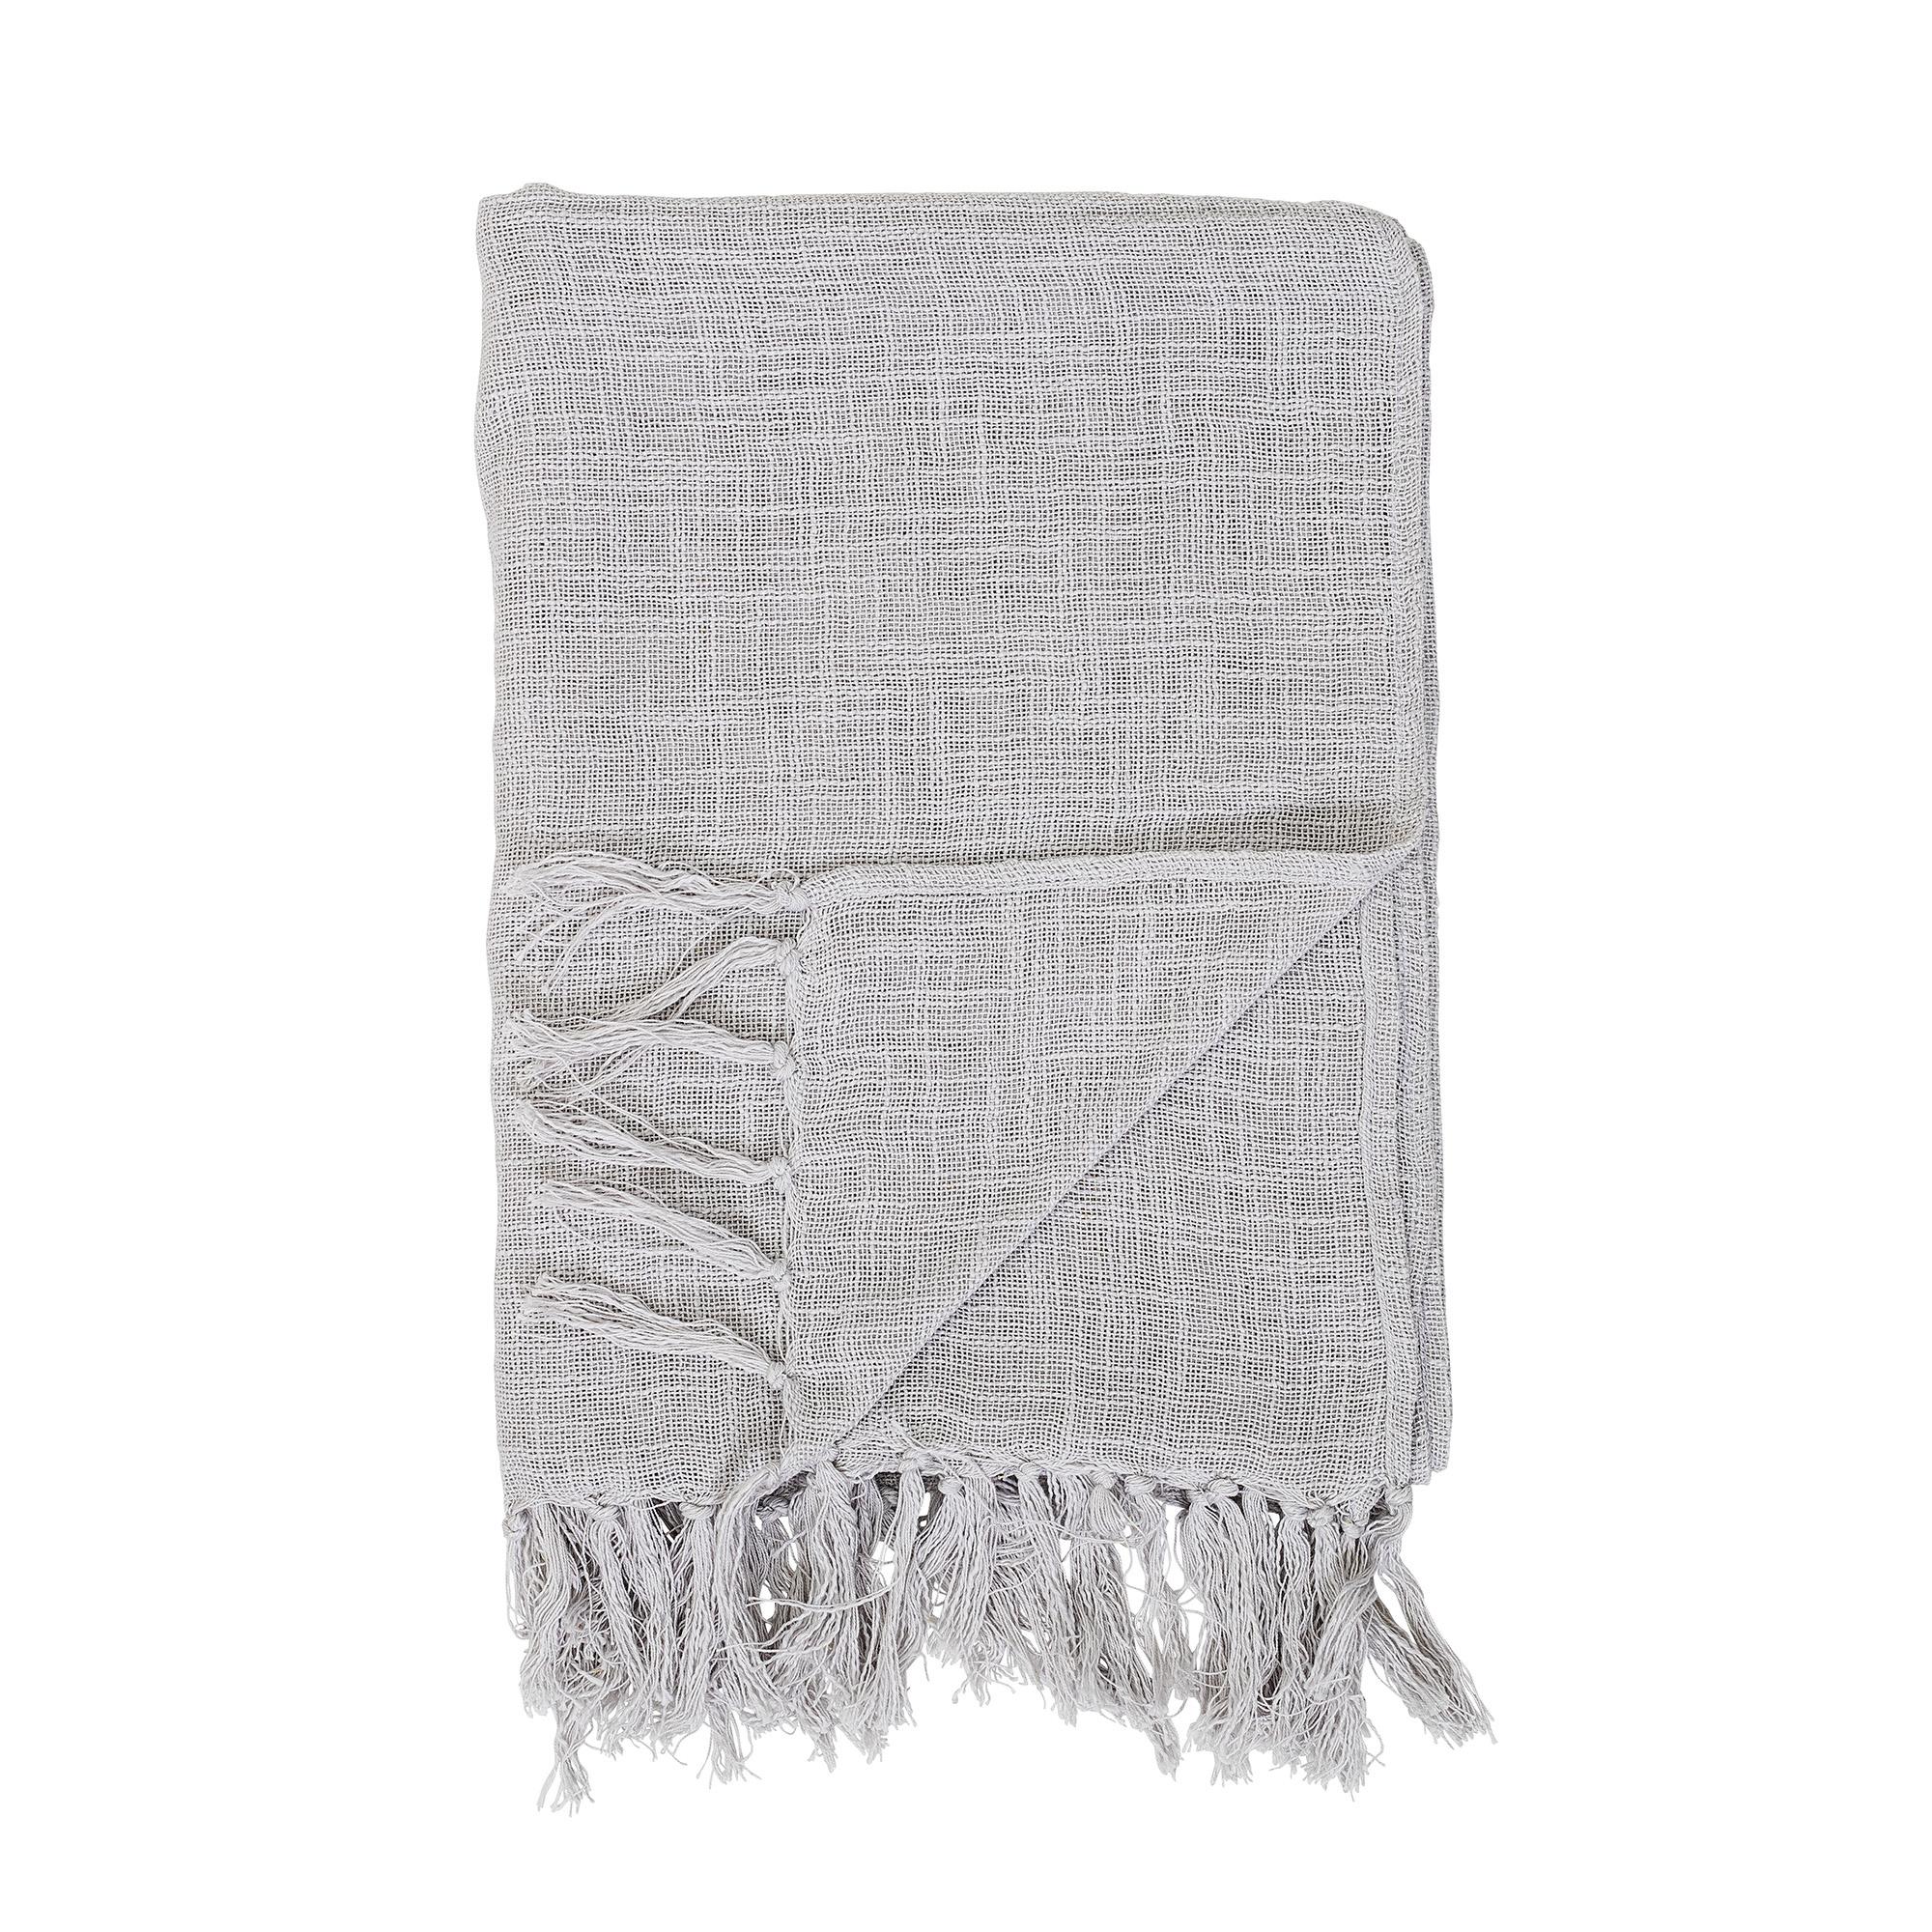 Bloomingville Plaid 100% cotton - grey - 130x170cm - Bloomingville